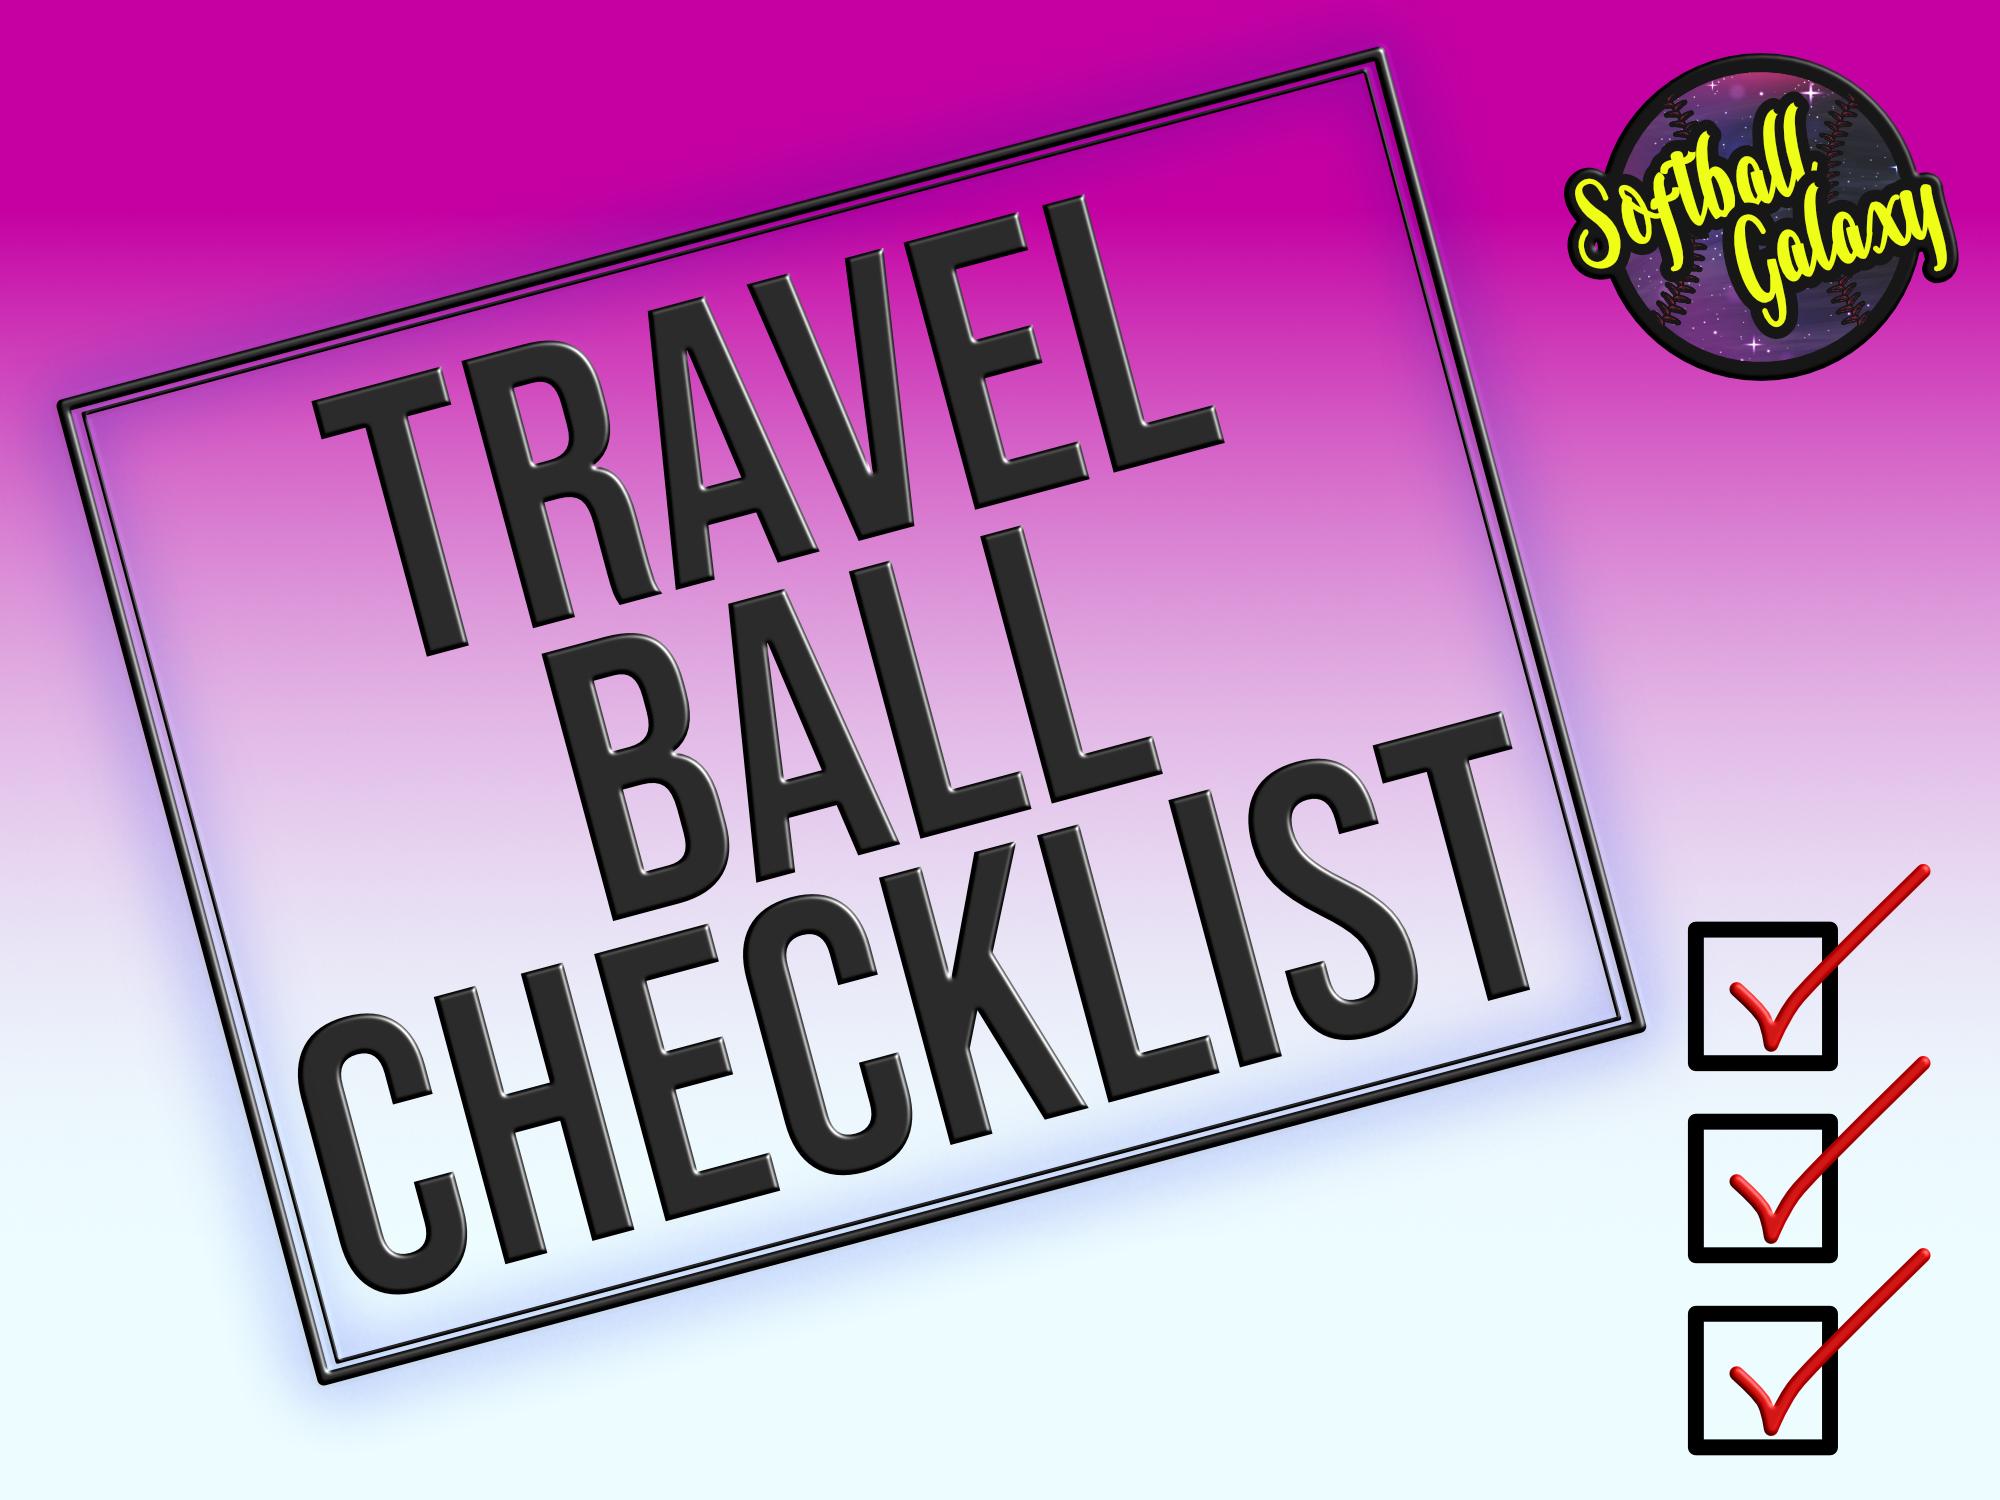 Travel Ball Checklist for Softball